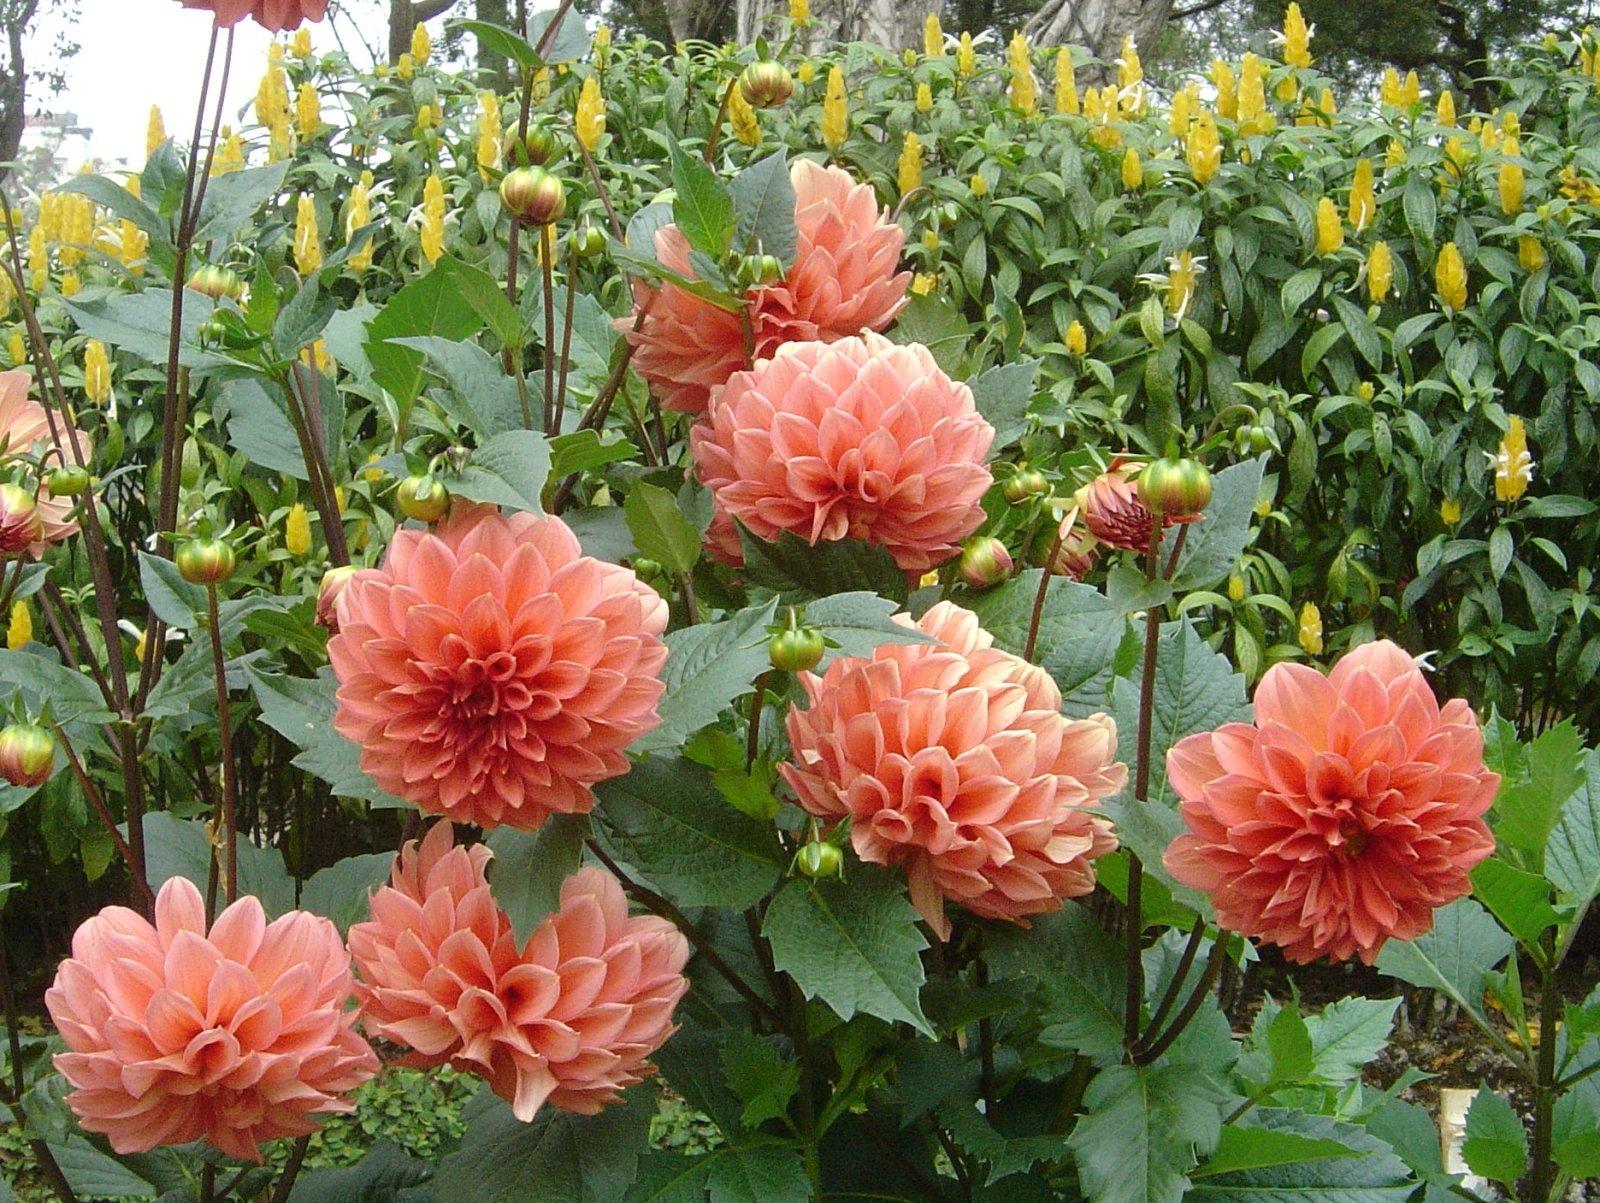 Beautiful Dahlia Flower Wallpaper Dahlia Flower Wallpaper Free